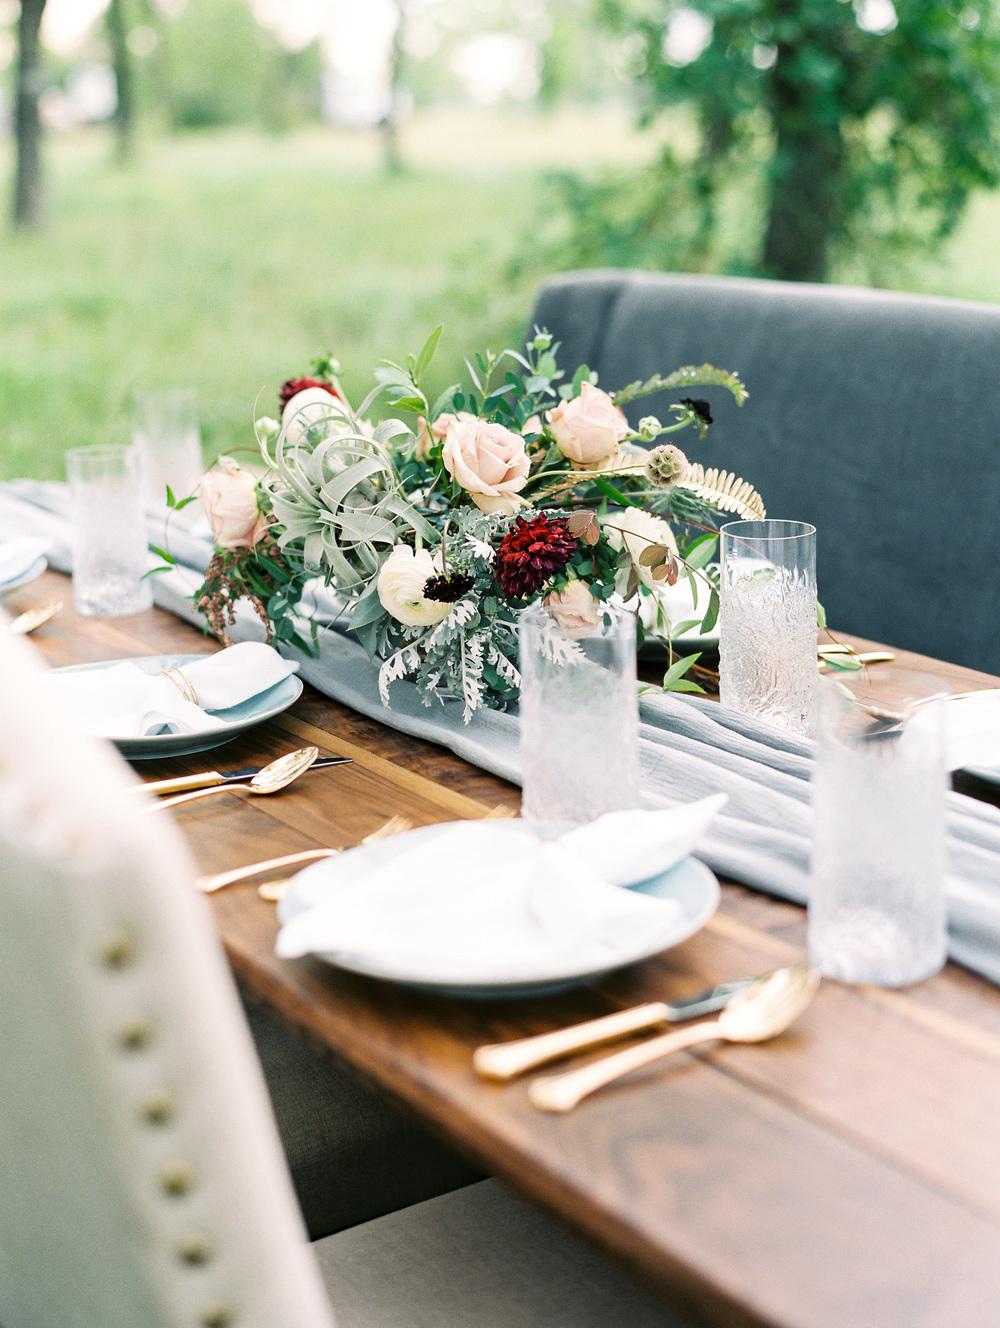 Dana-Fernandez-Photography-Houston-Wedding-Photographer-Film-100-Layer-Cake-Wedding-Inspiration-Destination-10.jpg